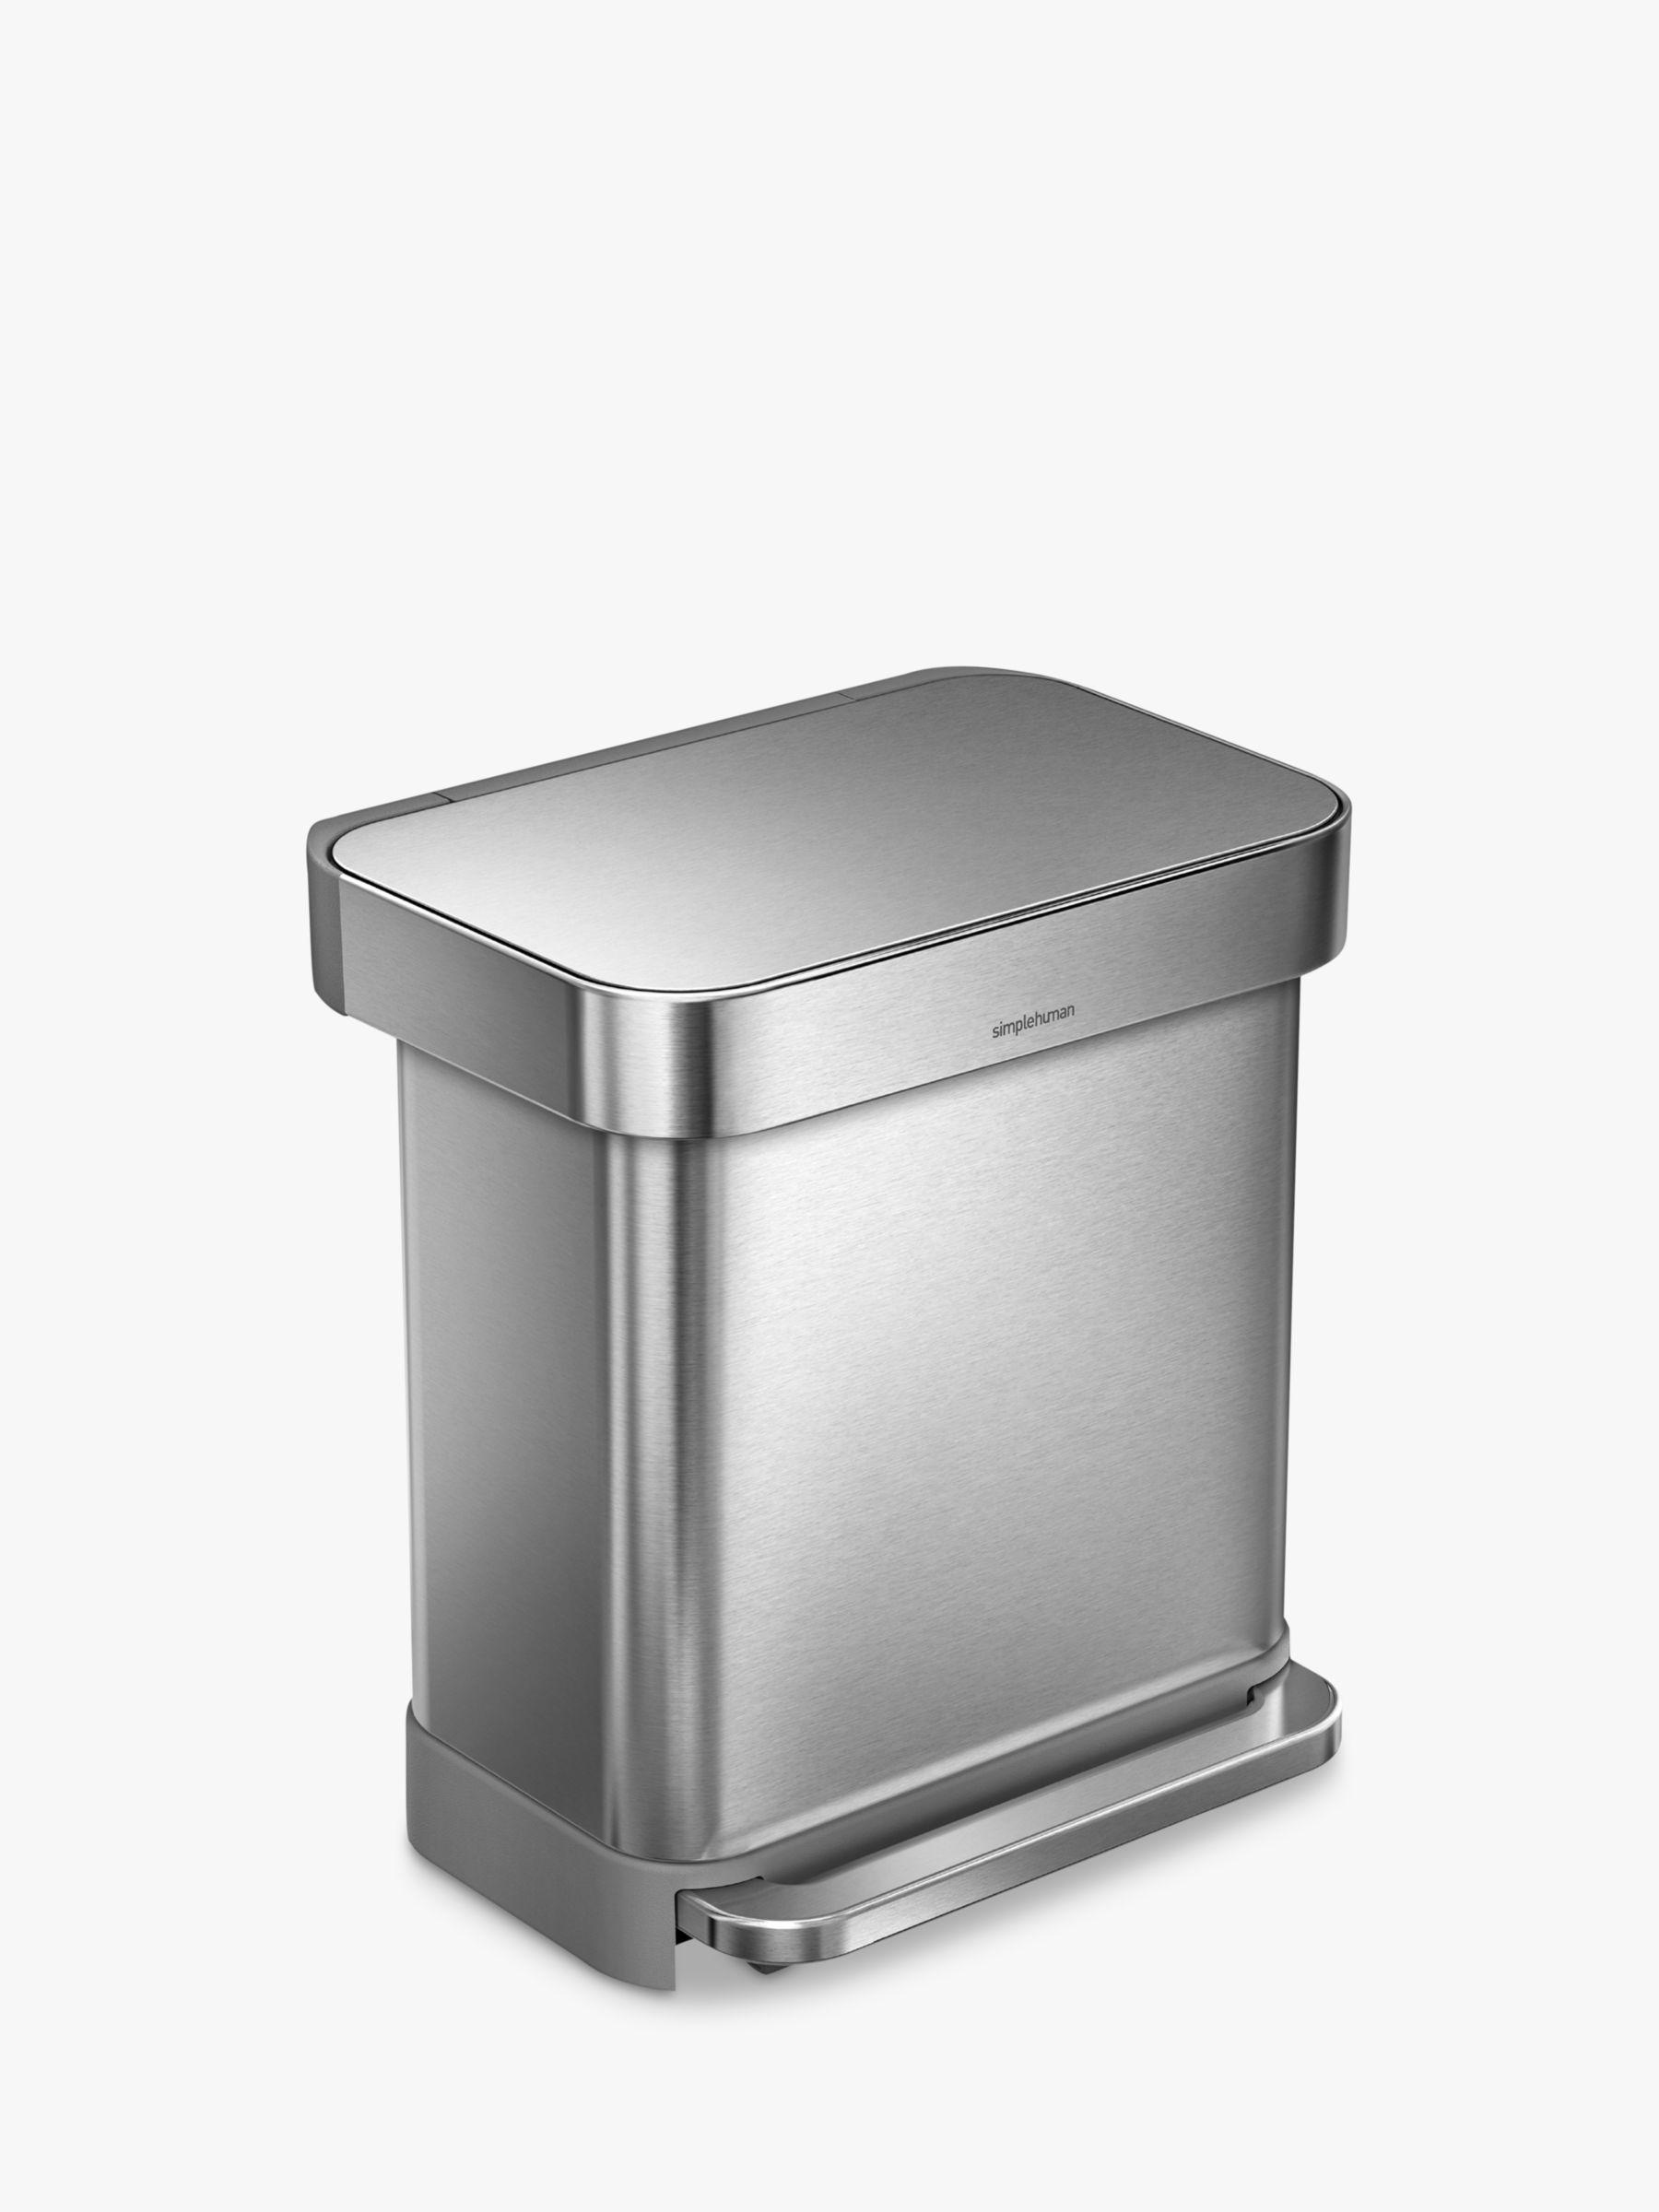 Simplehuman simplehuman Liner Pocket Pedal Bin, Brushed Steel, 30L